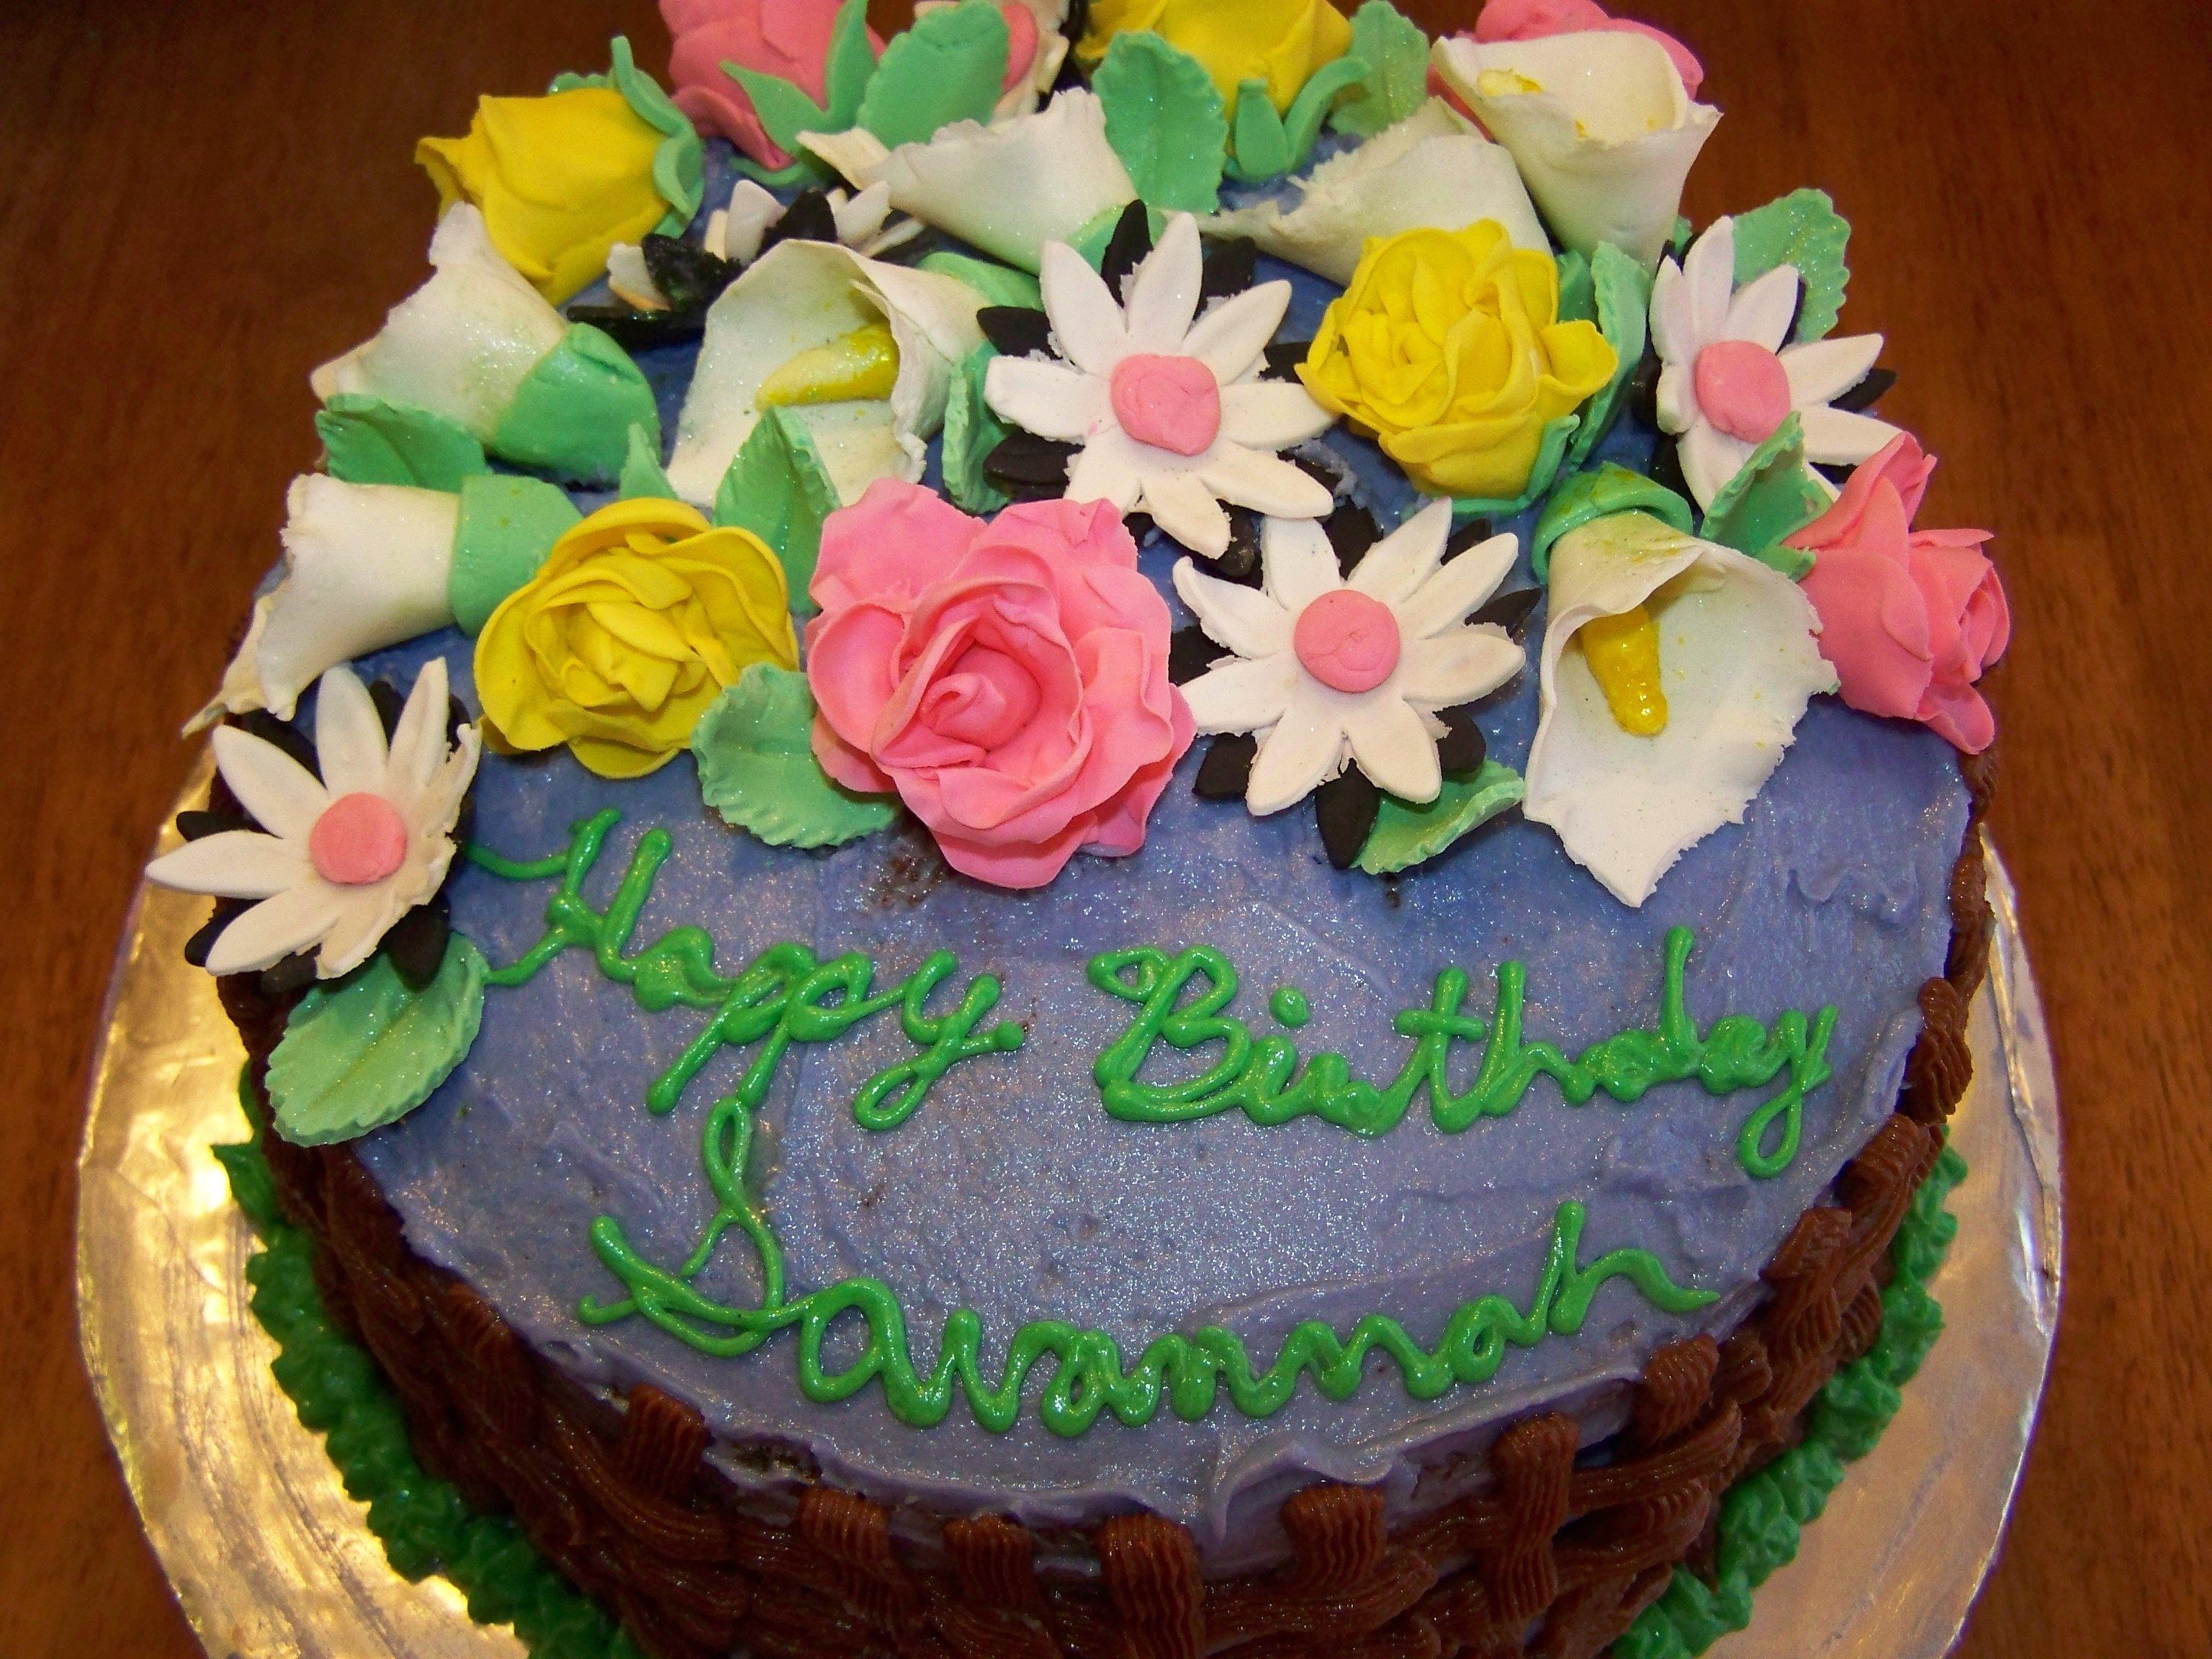 My 18th Birthday Cake Yes I Make Own Cakes